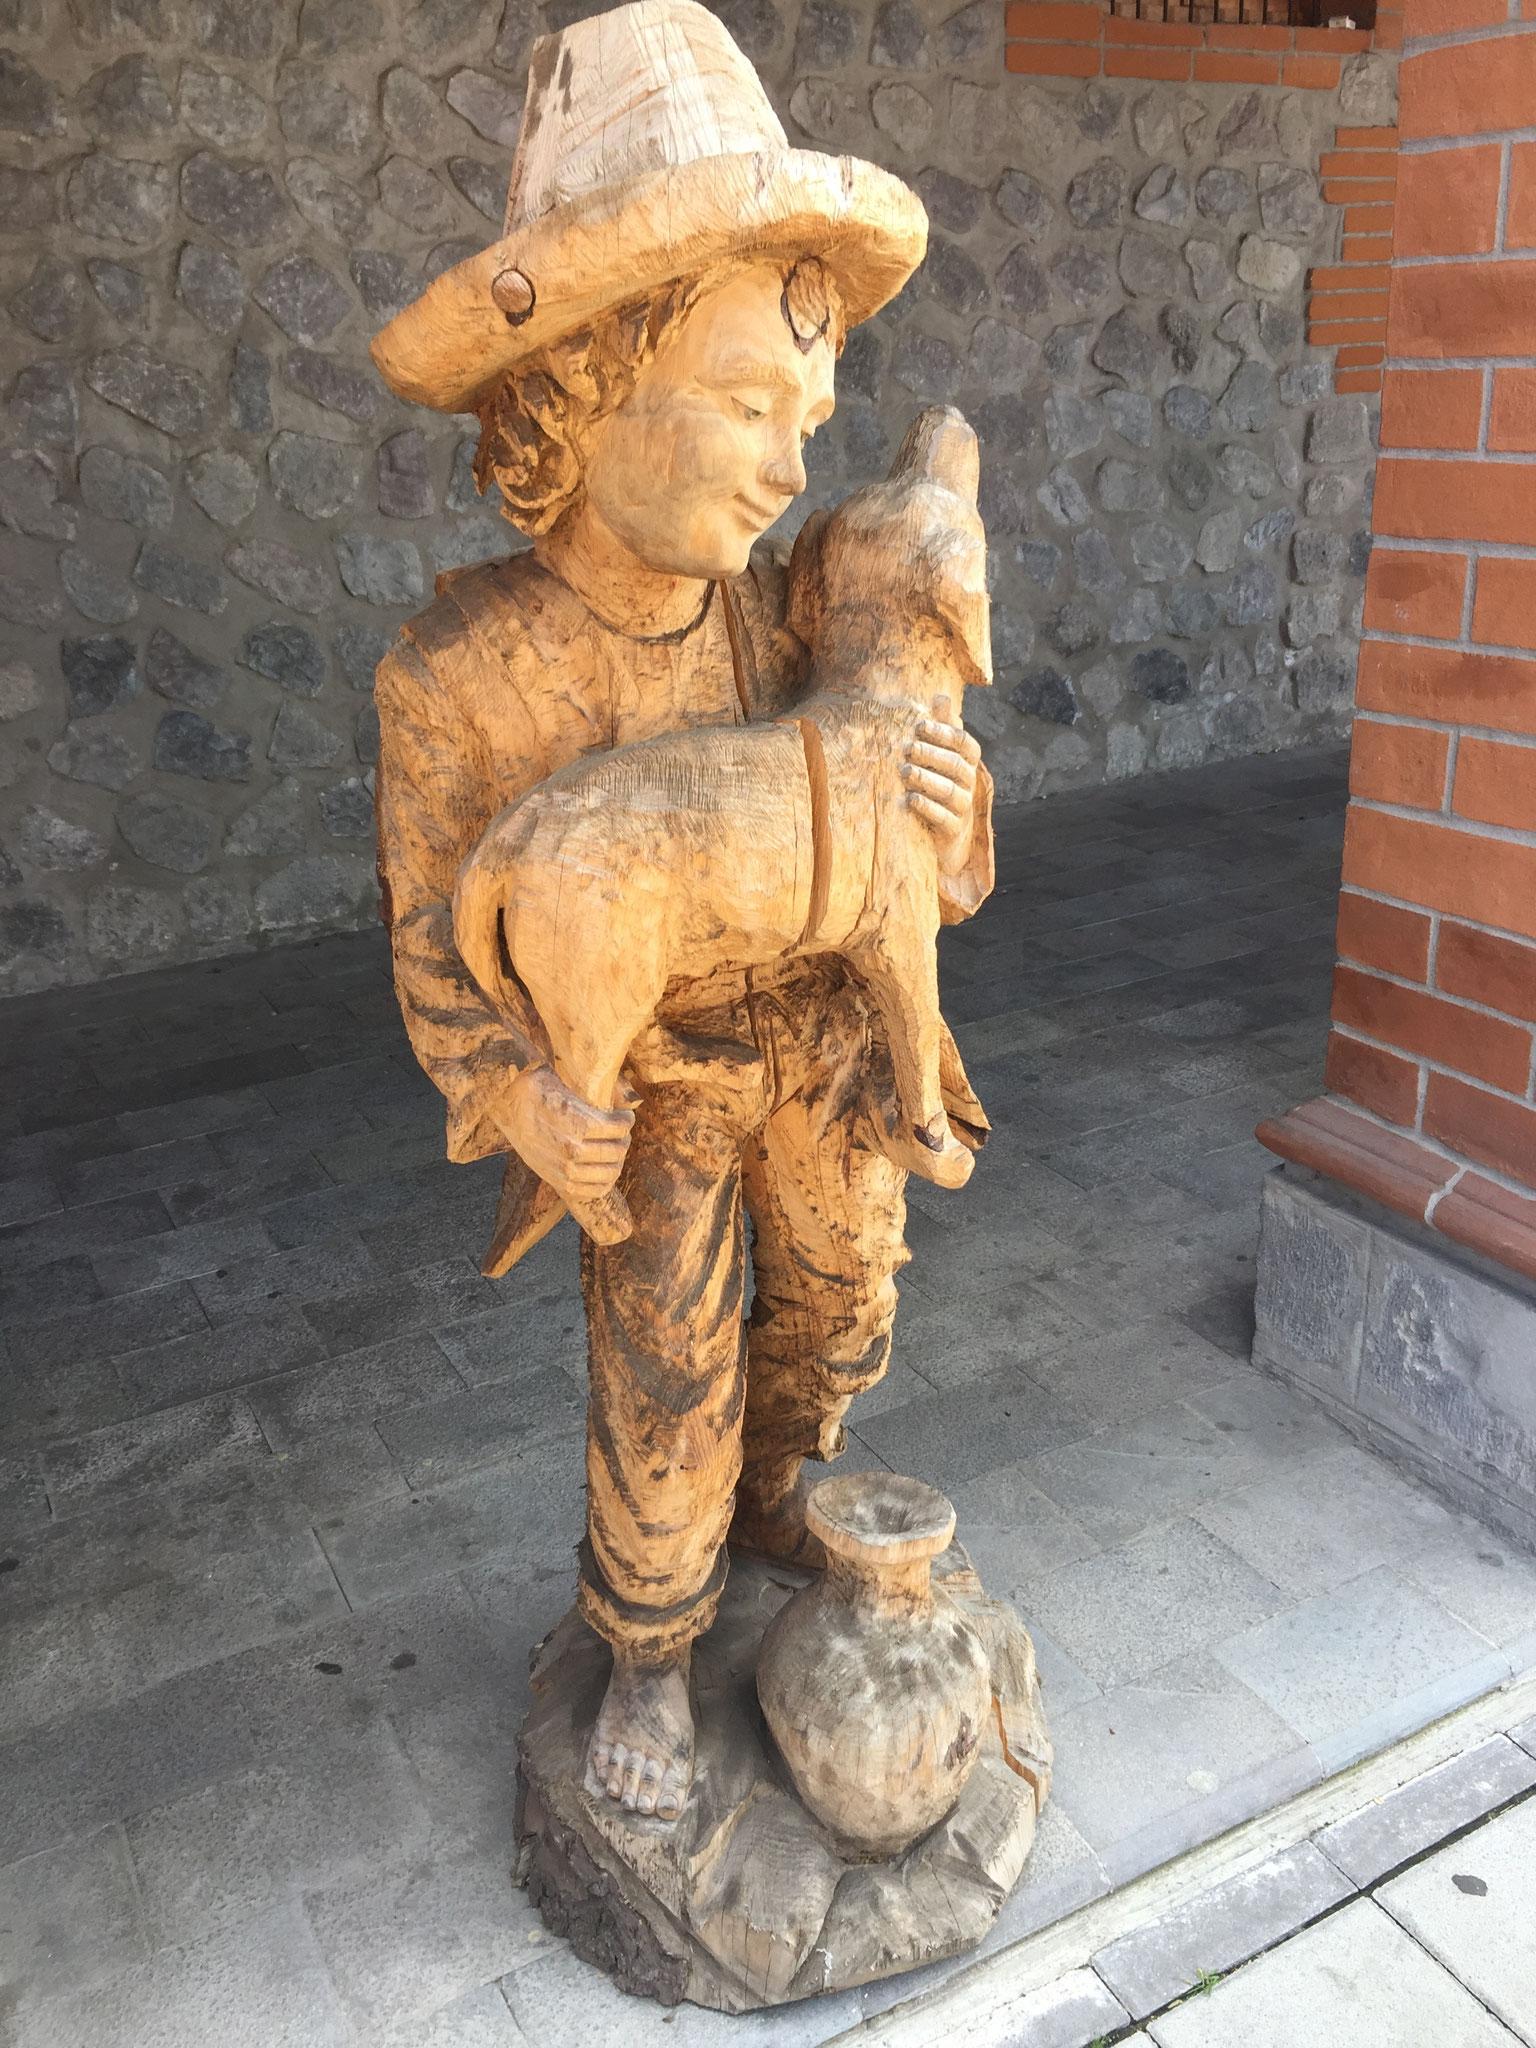 Holzschnitzereien in Ibarra